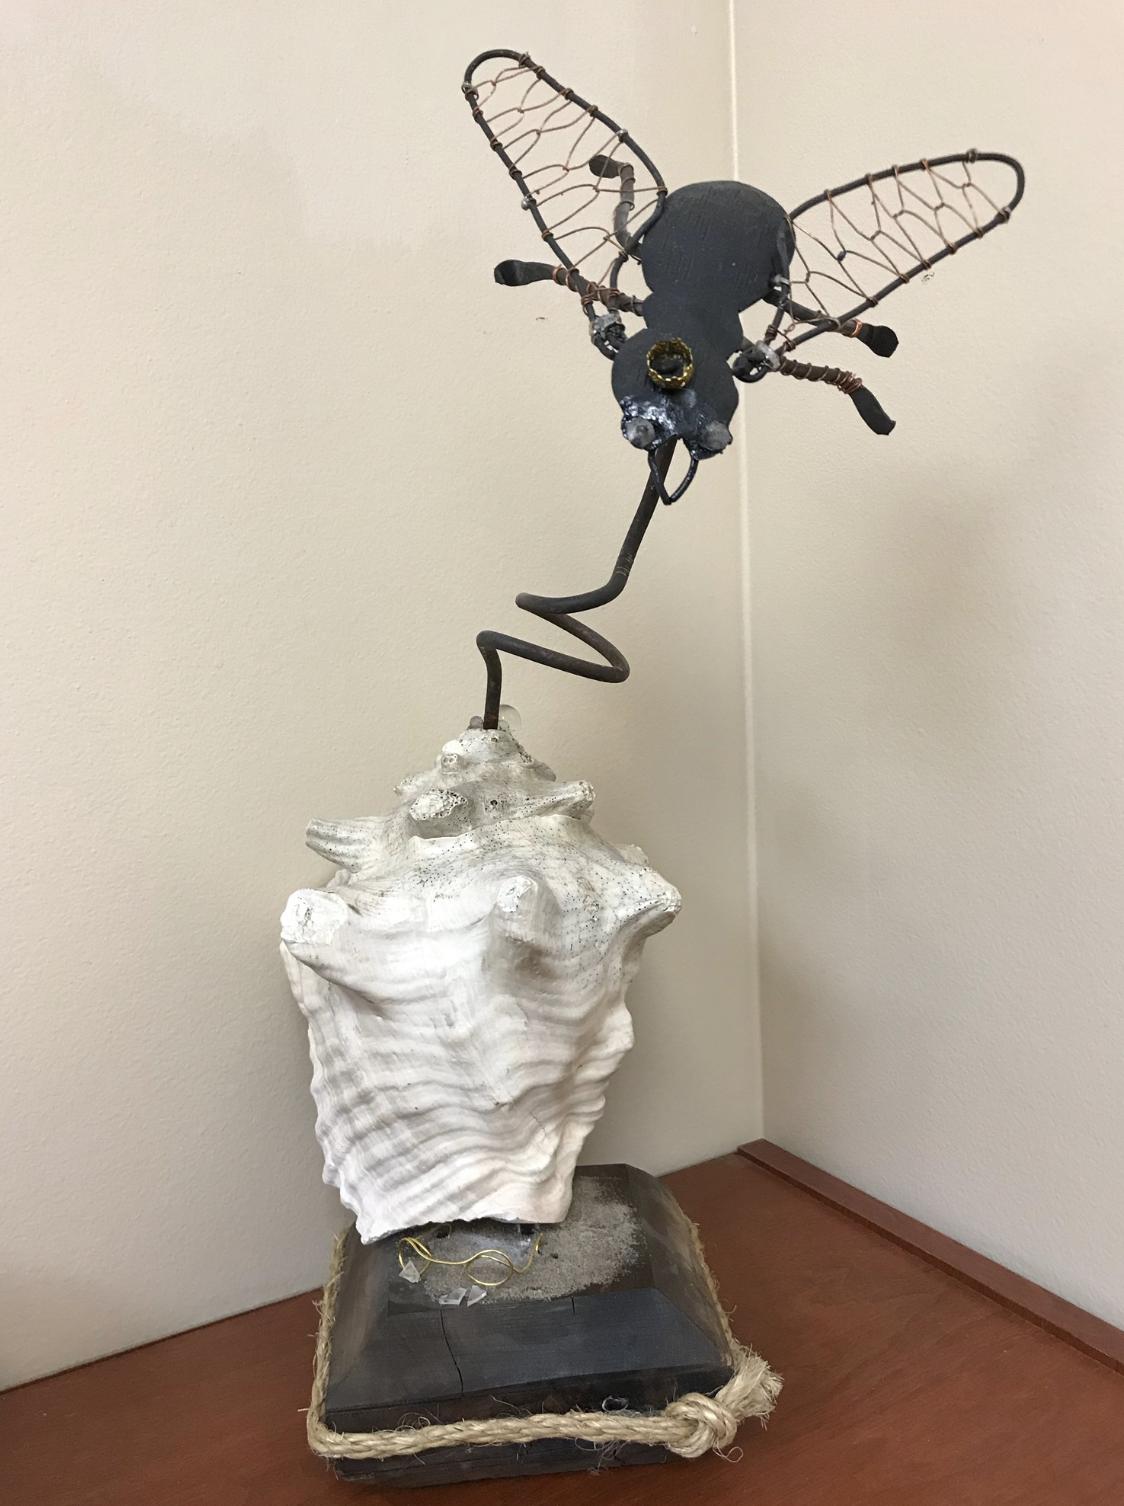 Student created art piece.